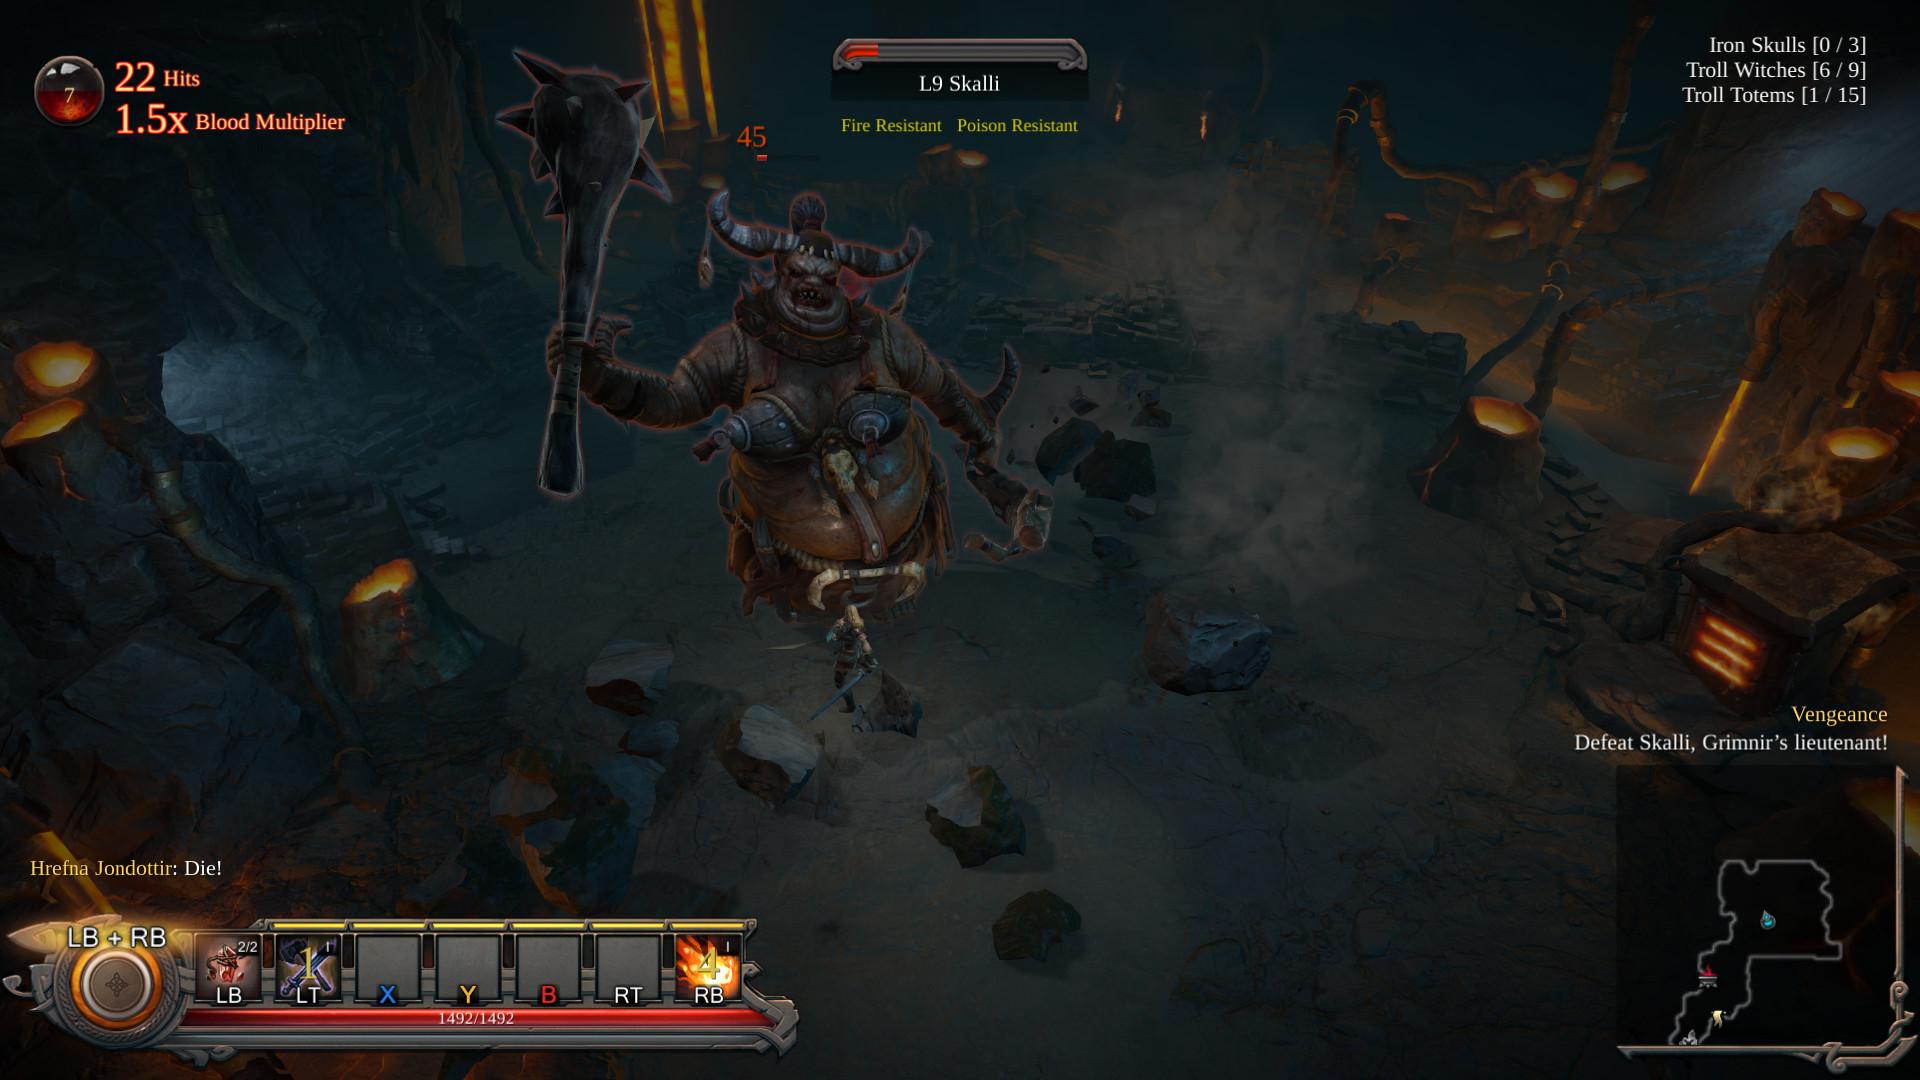 Vikings - Wolves of Midgard Screenshot 2